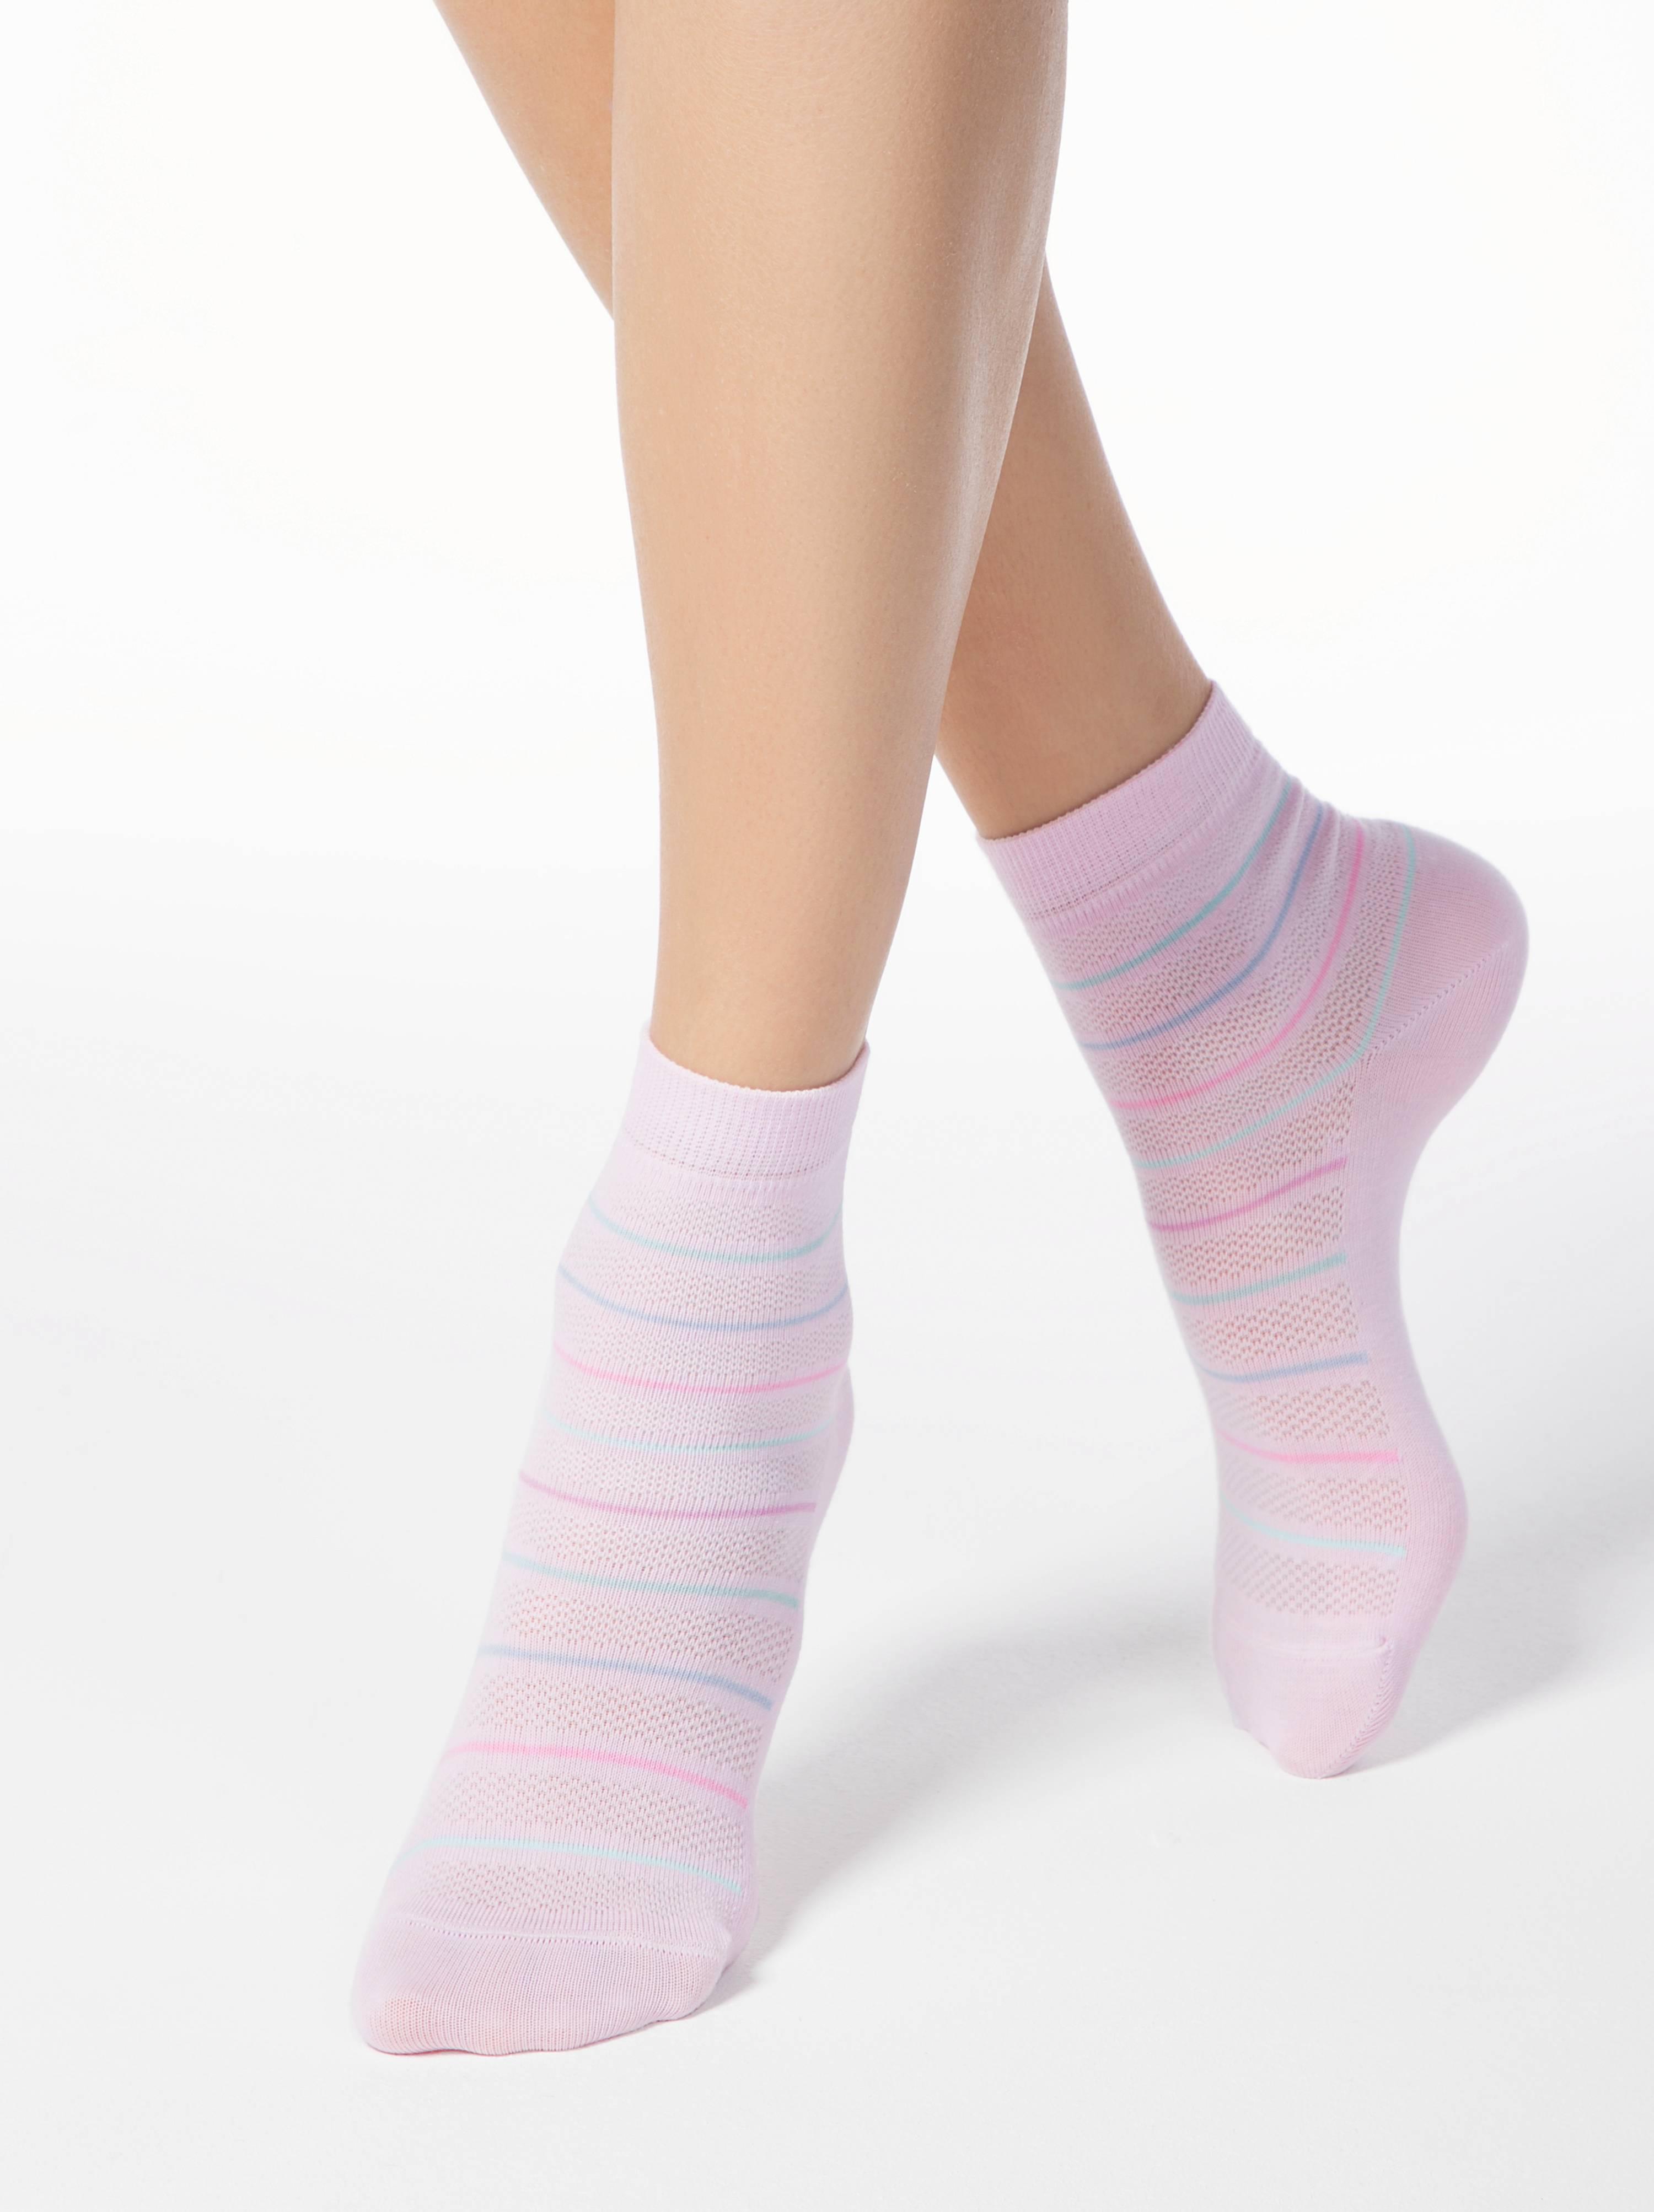 Хлопковые носки CLASSIC фото